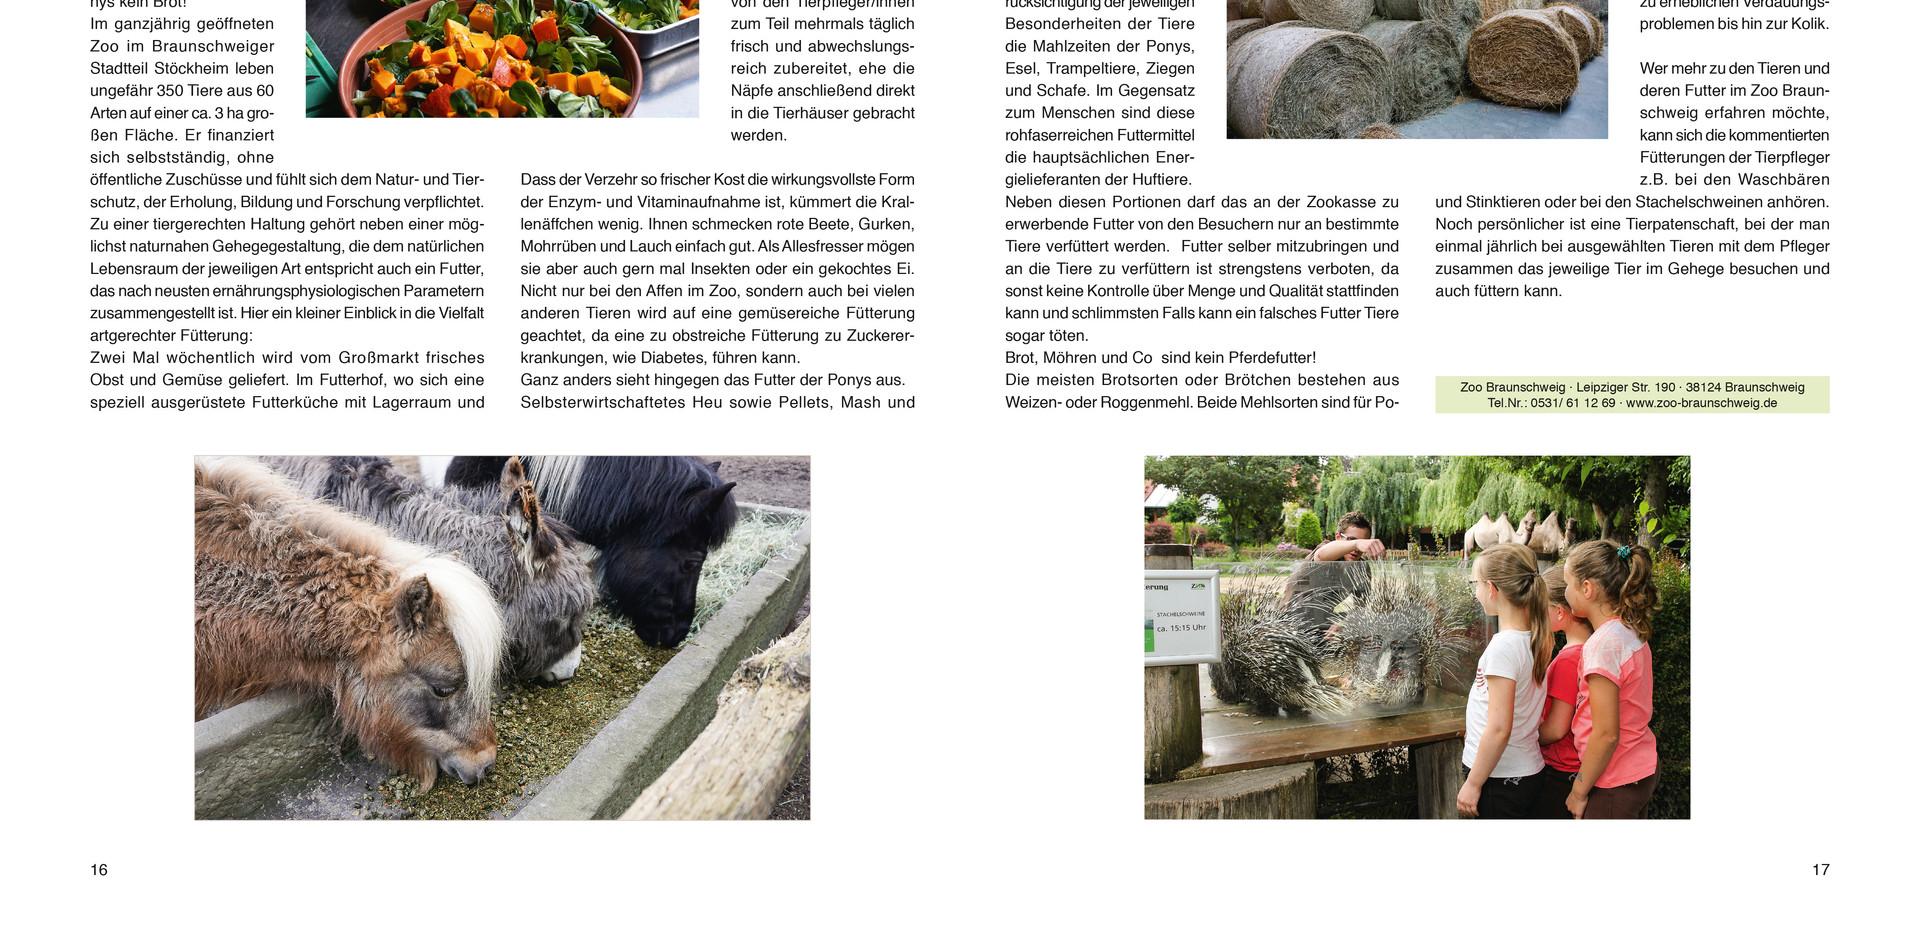 Zzt 3_S.16-17.jpg